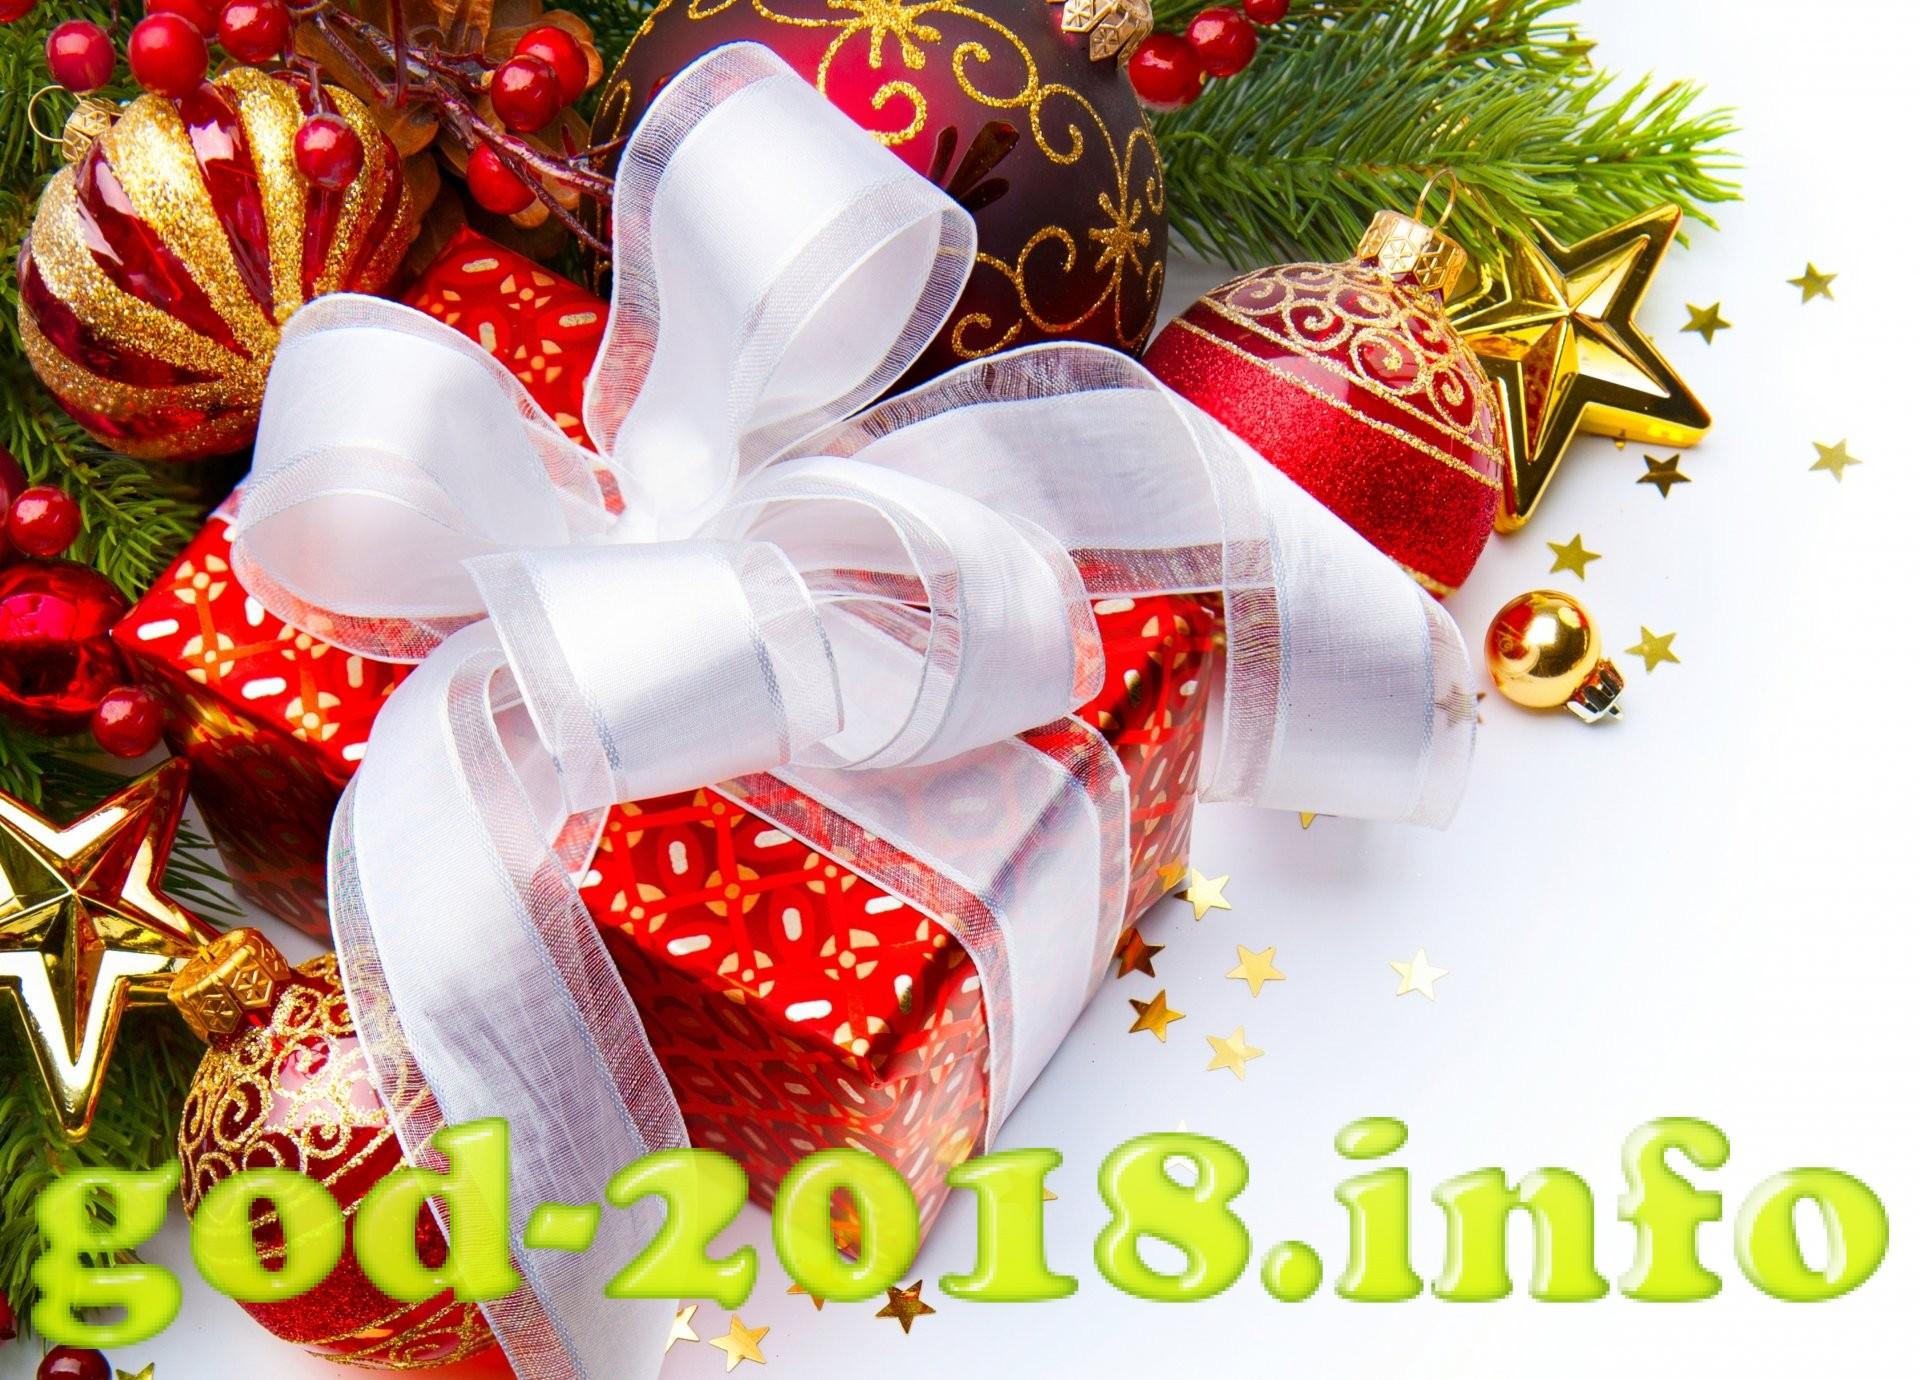 interesnye-pozdravlenija-s-novym-godom-2018-dlja-druzej-4